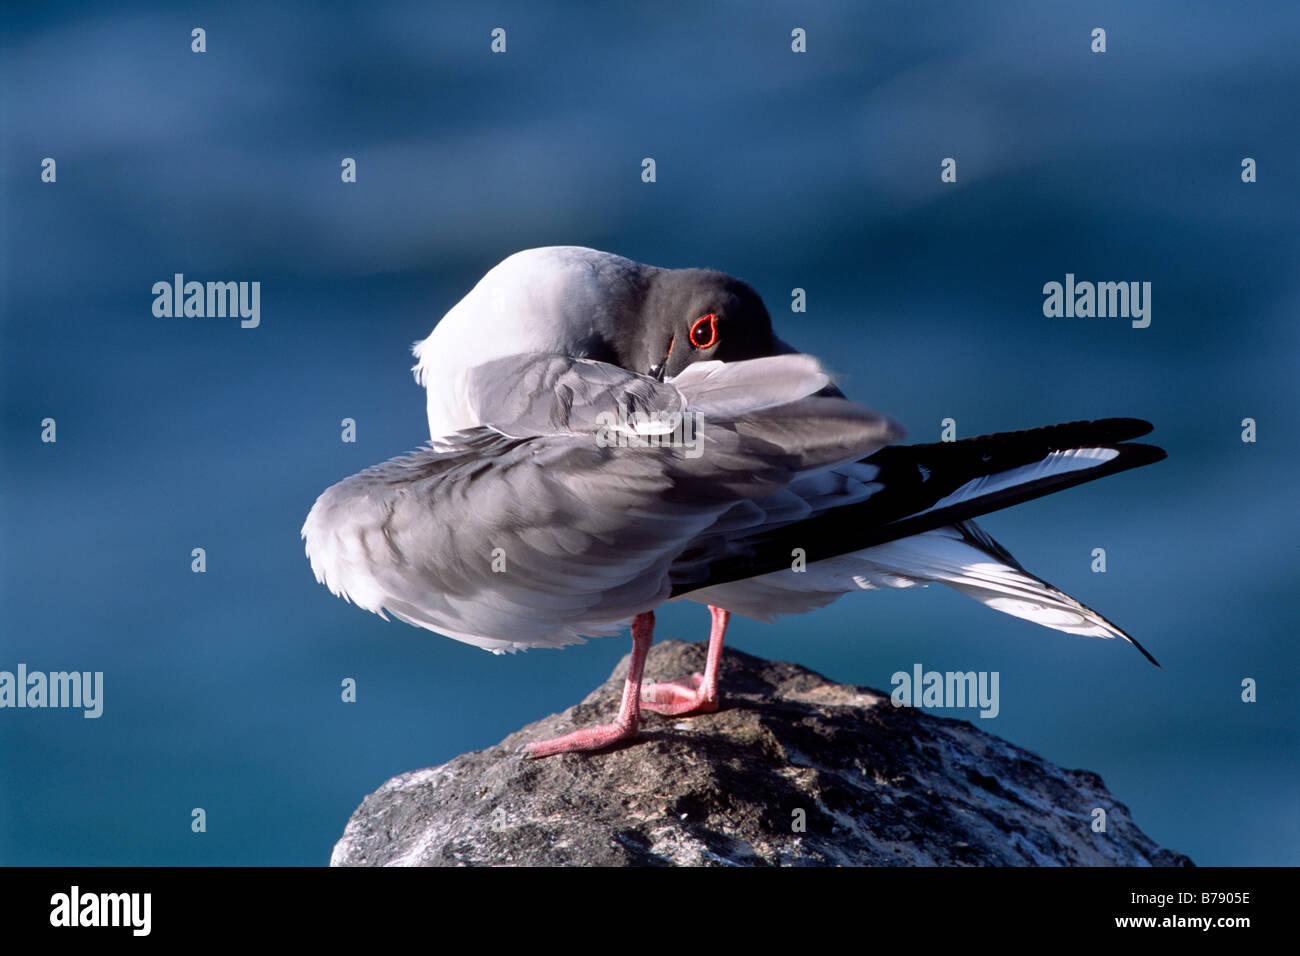 Swallow-tailed gull (Creagrus furcatus) preening, Insel Espanola, Galapagos Inseln, Galapagos Islands, Ecuador, - Stock Image